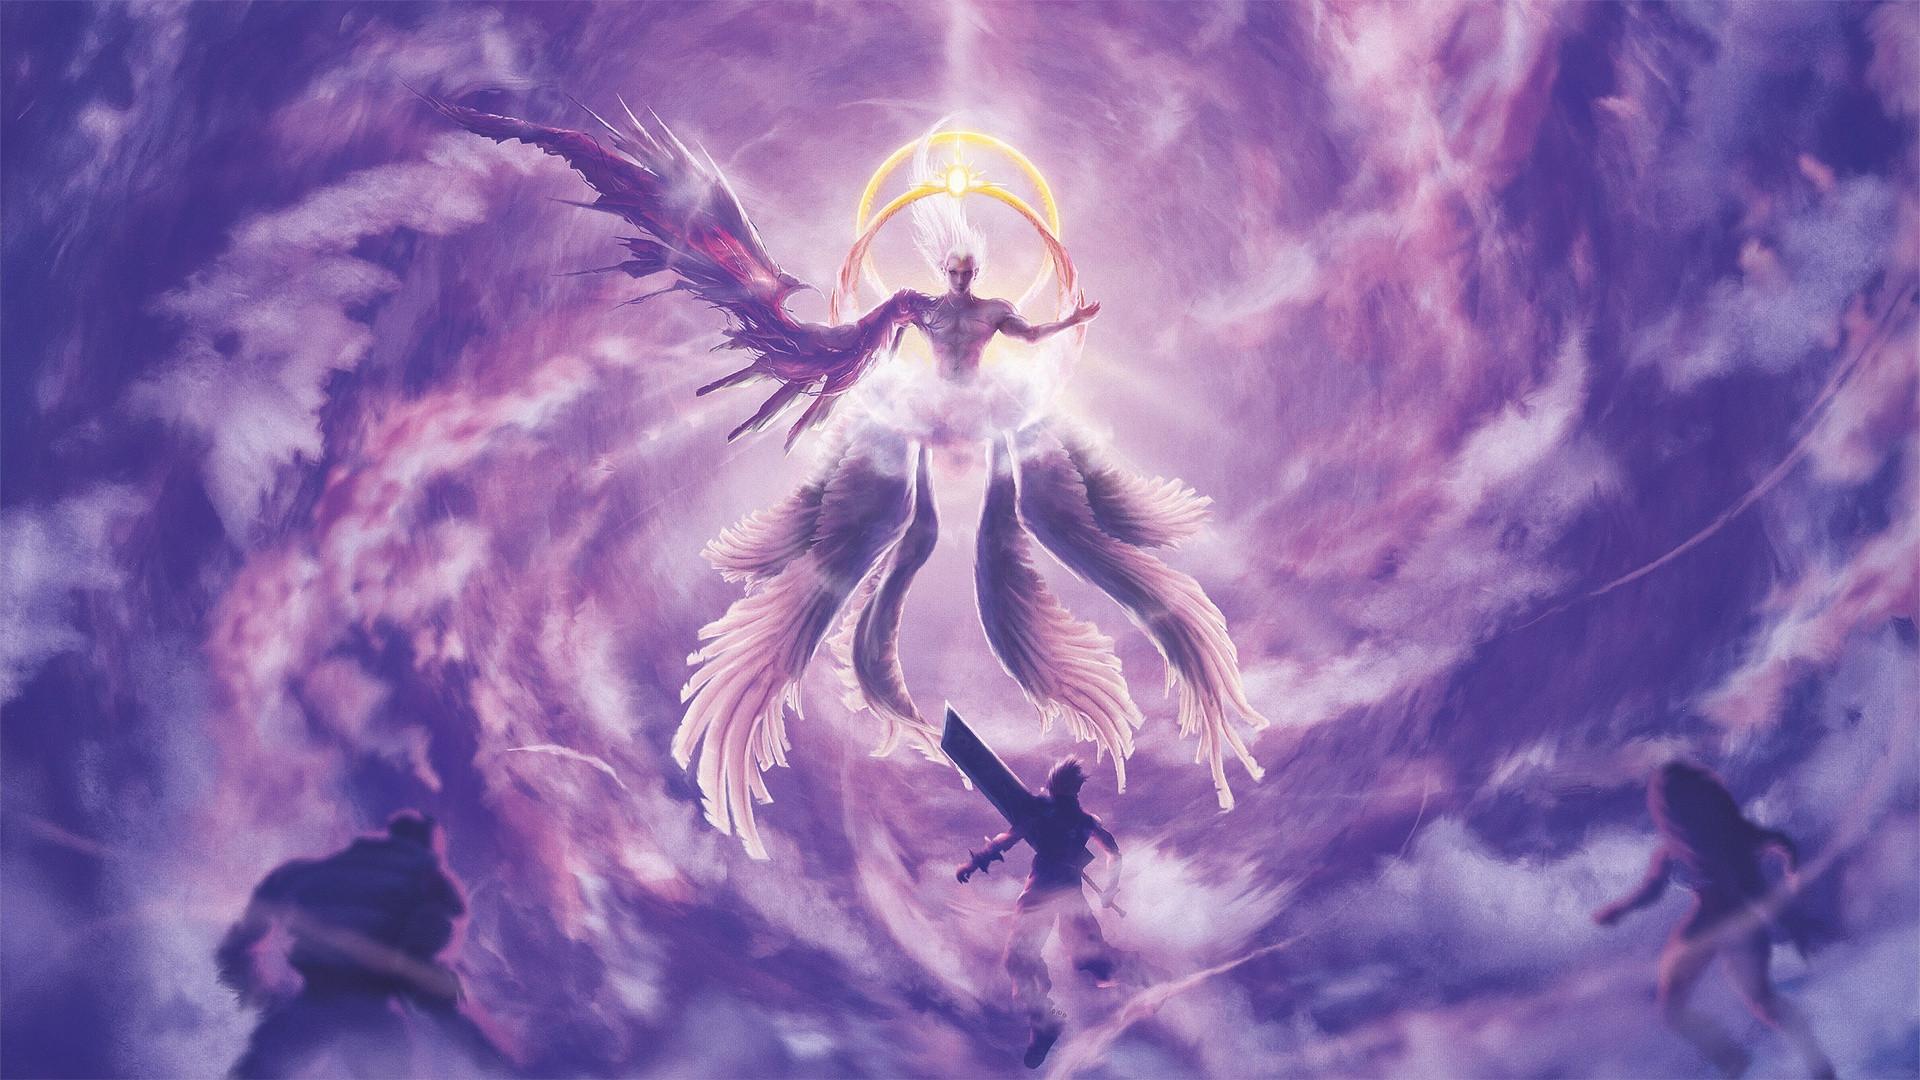 Final Fantasy Sephiroth Wallpaper 70 Images